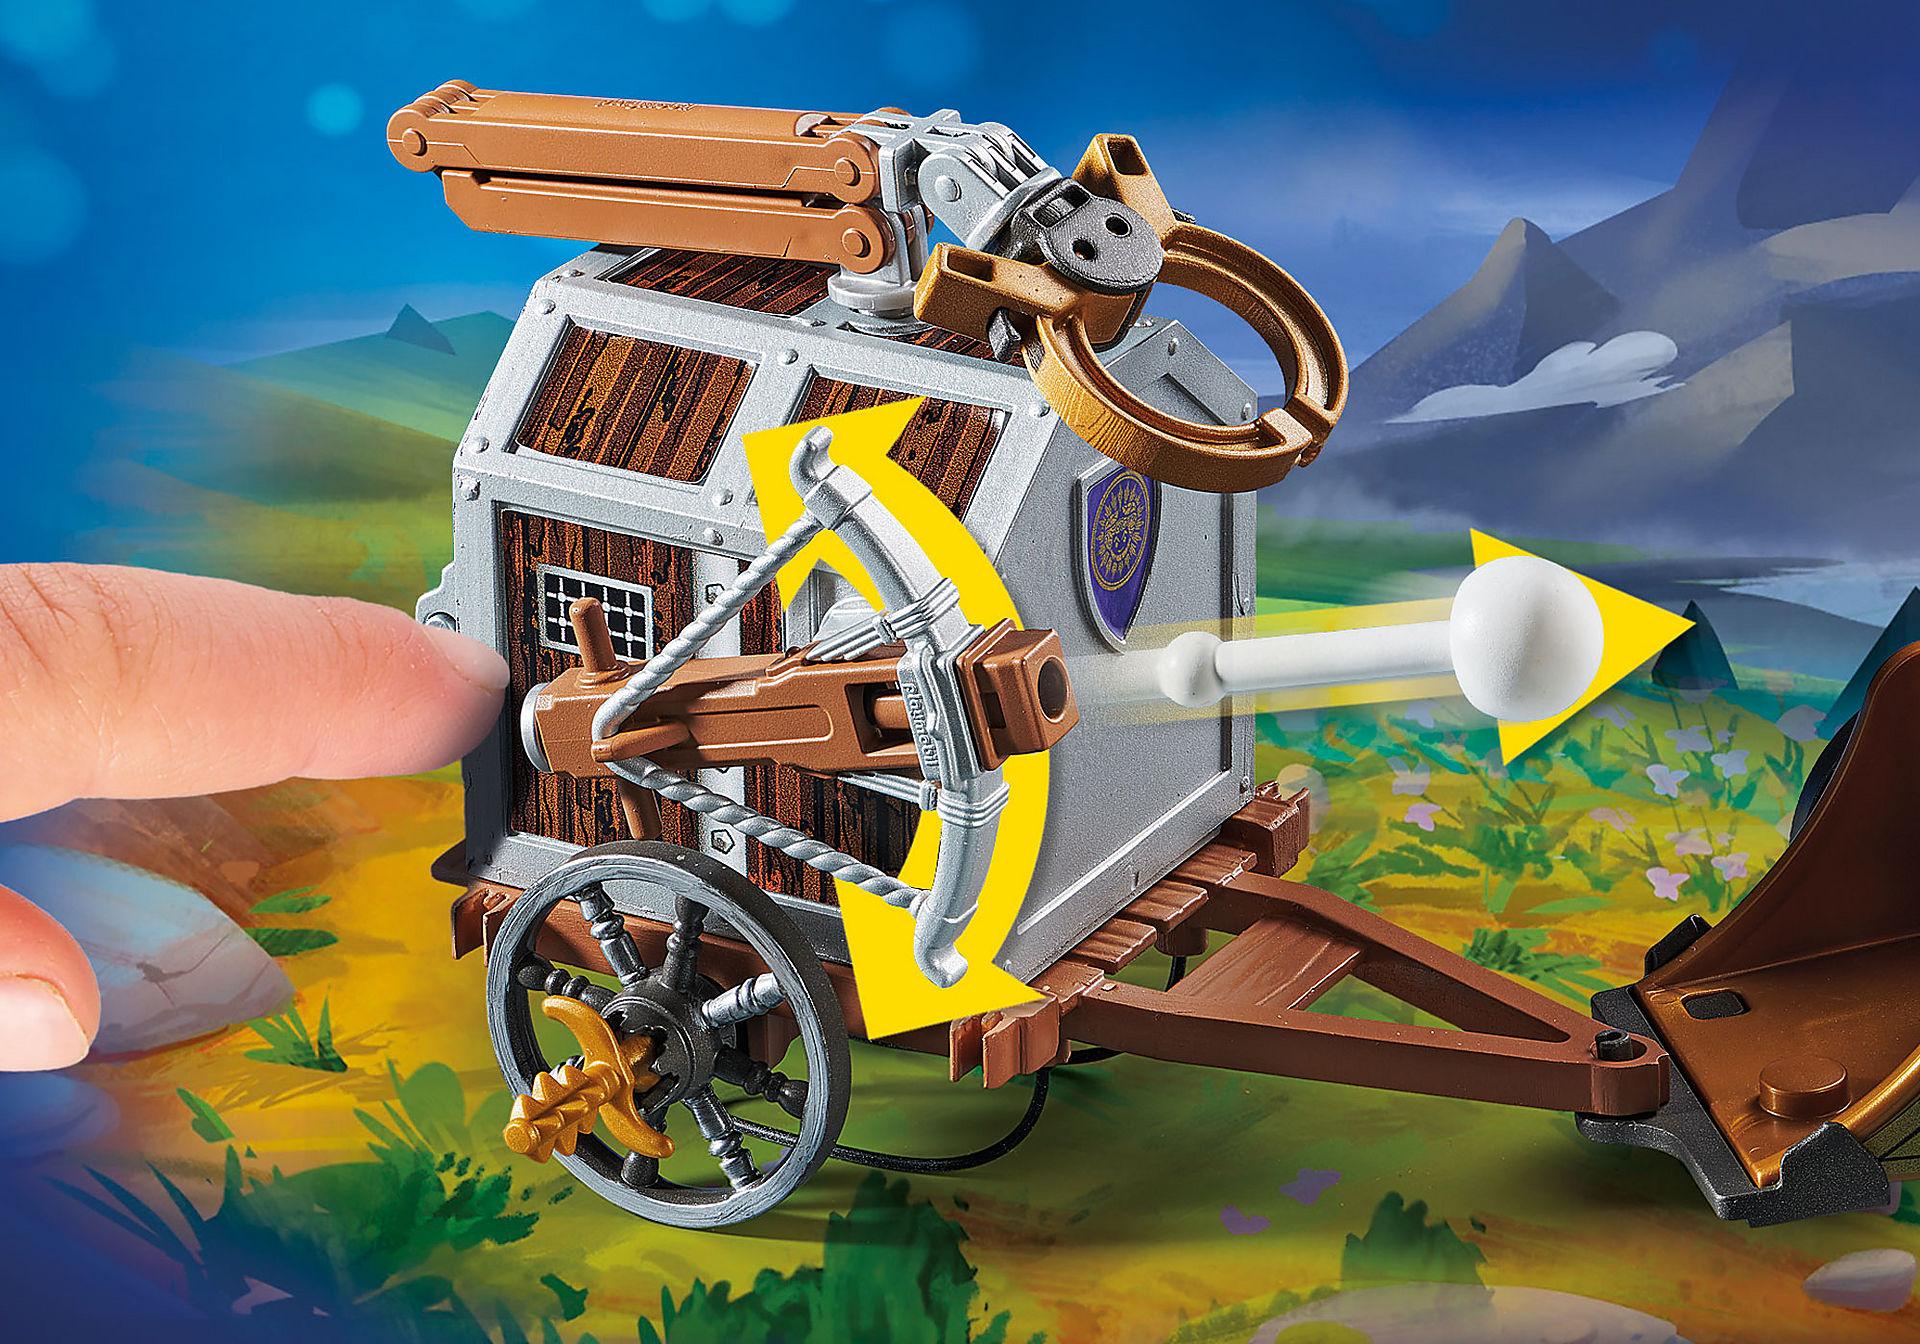 http://media.playmobil.com/i/playmobil/70073_product_extra1/PLAYMOBIL: THE MOVIE Charlie con Carro Prisión